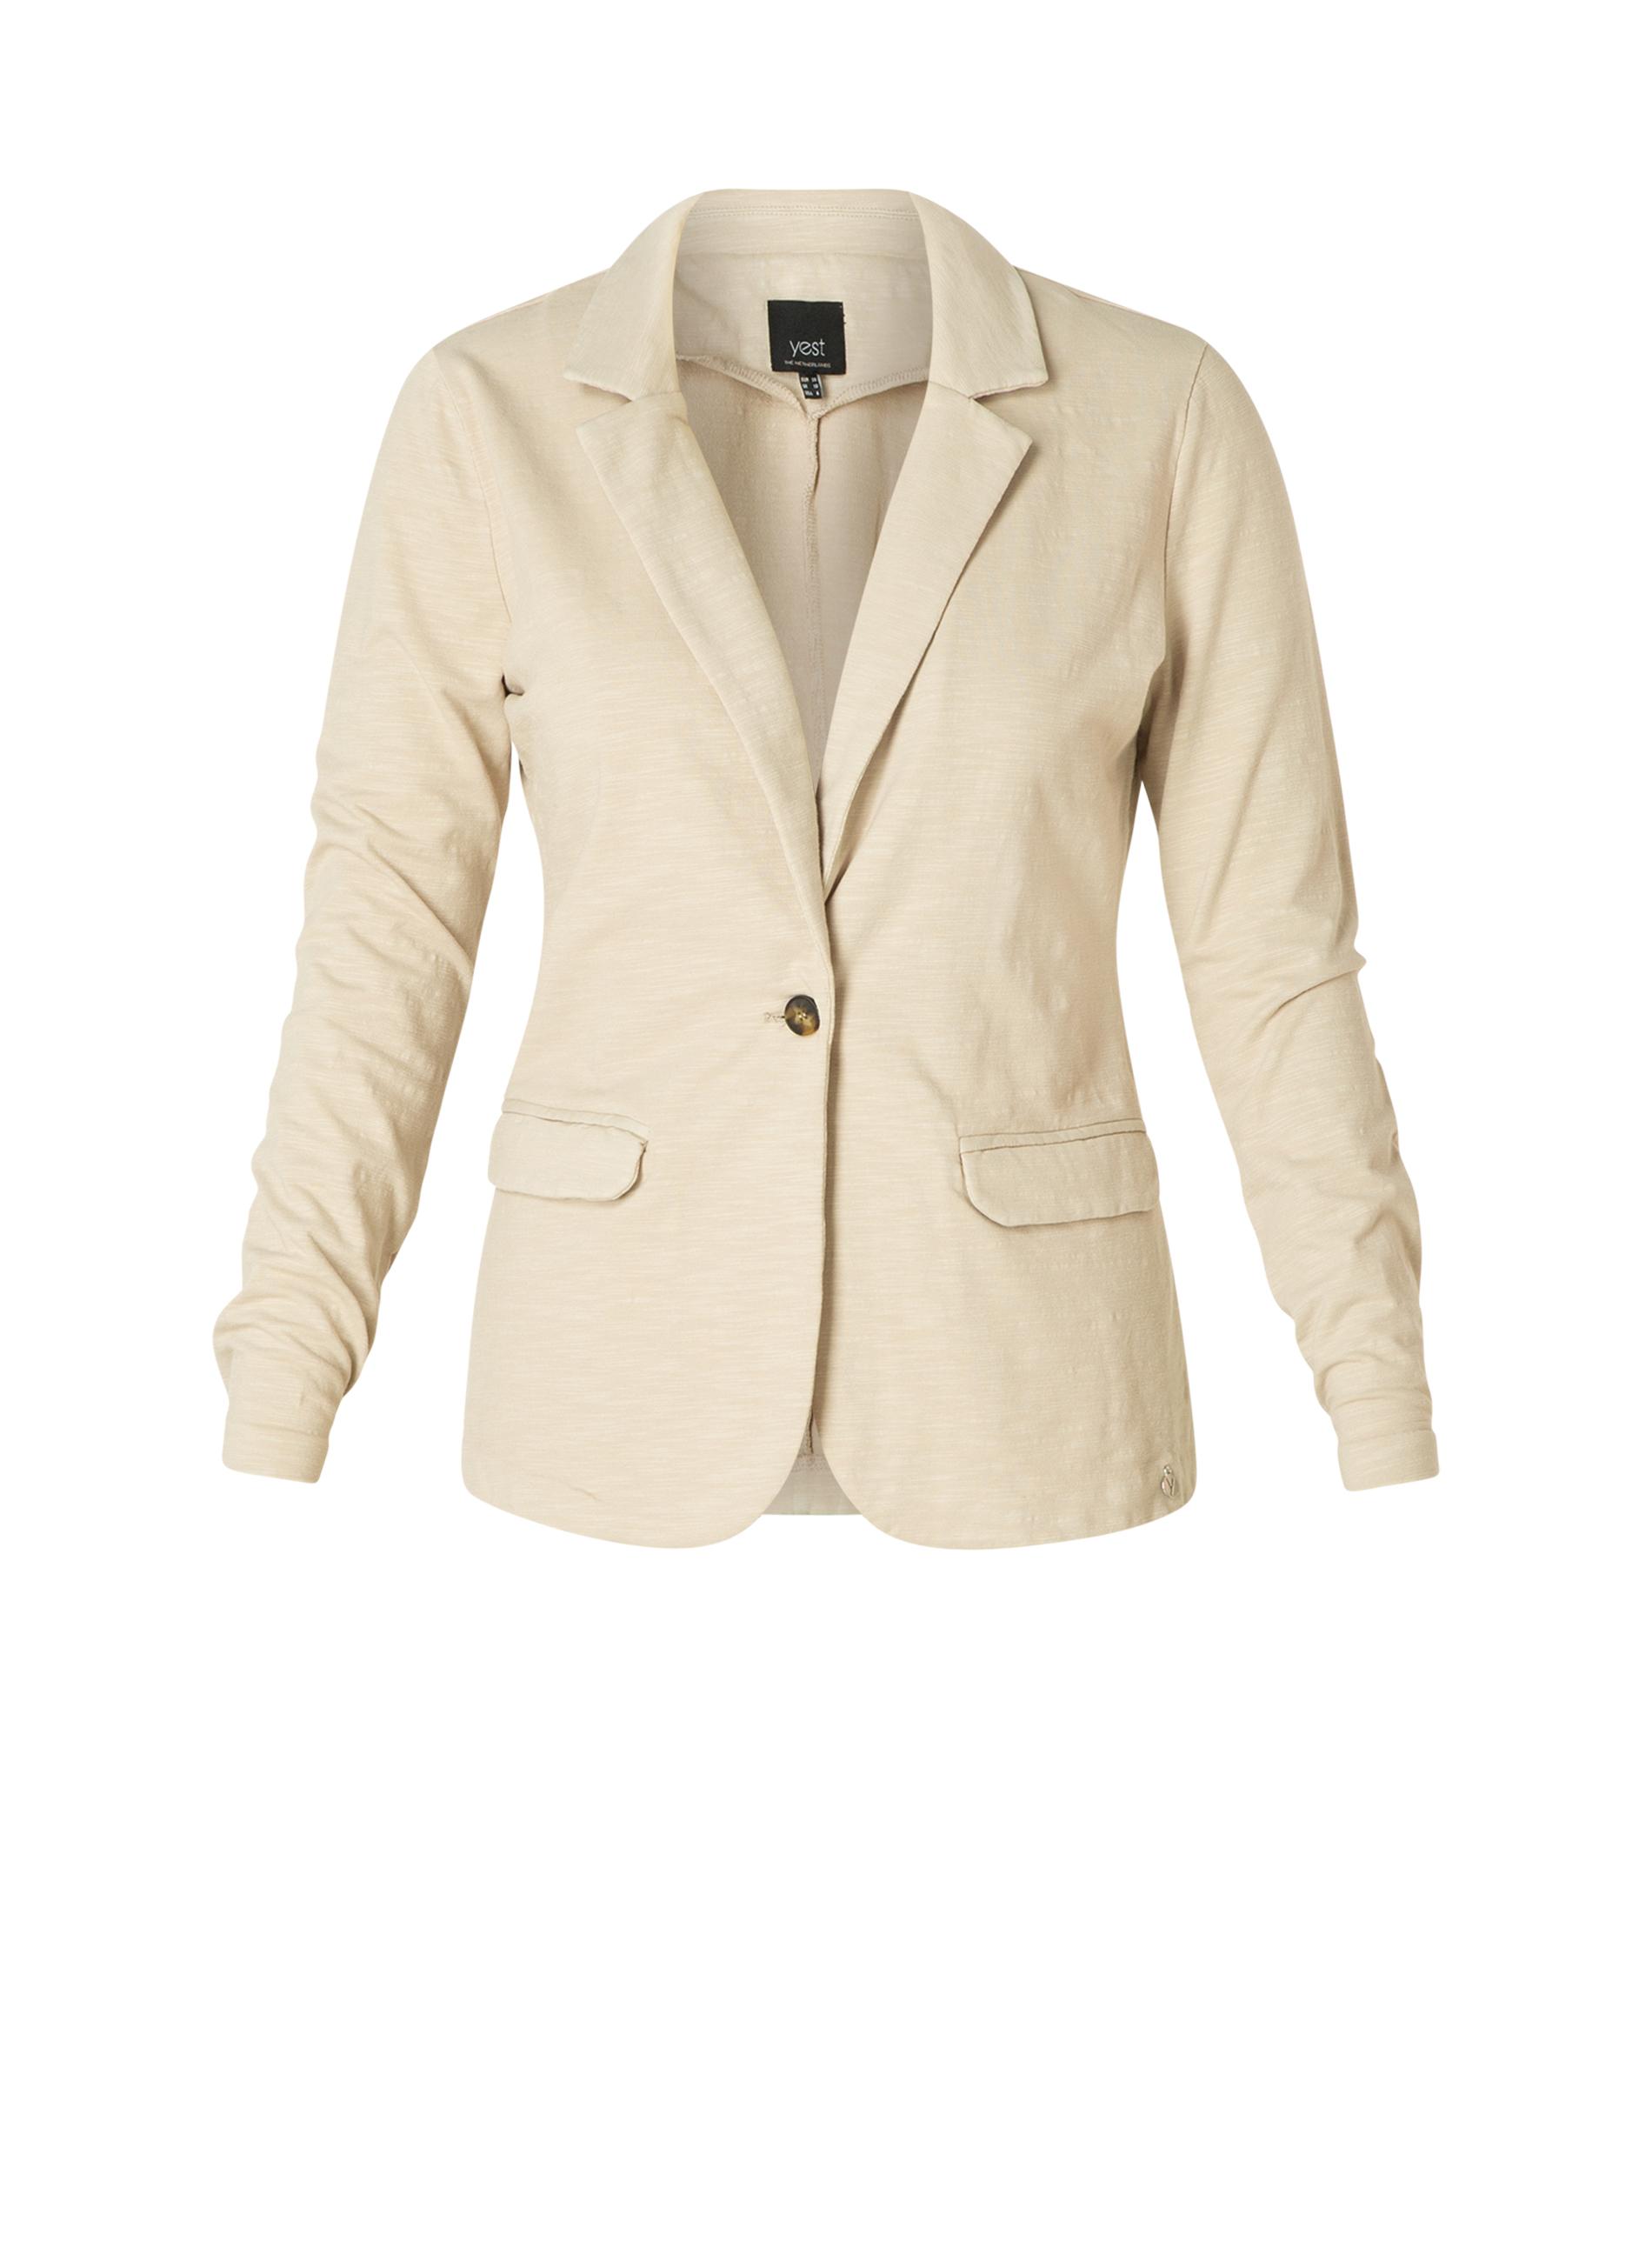 Yest jacket Yolie Essential 67 cm